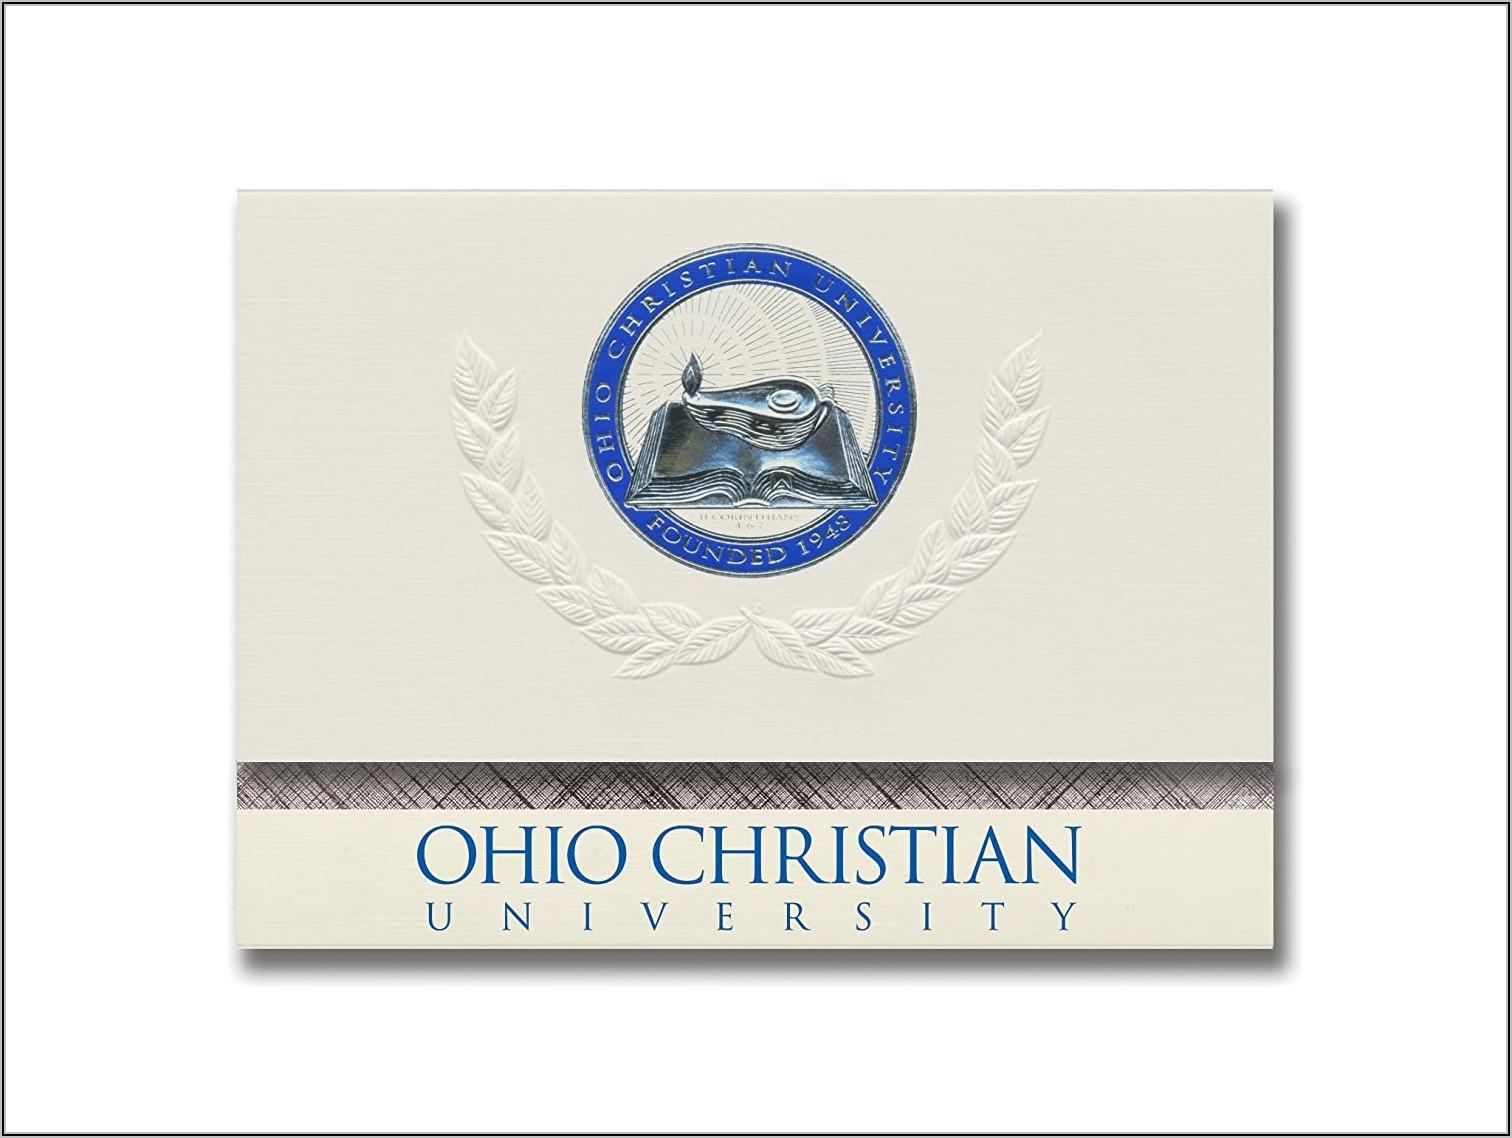 Ohio University Graduation Announcements